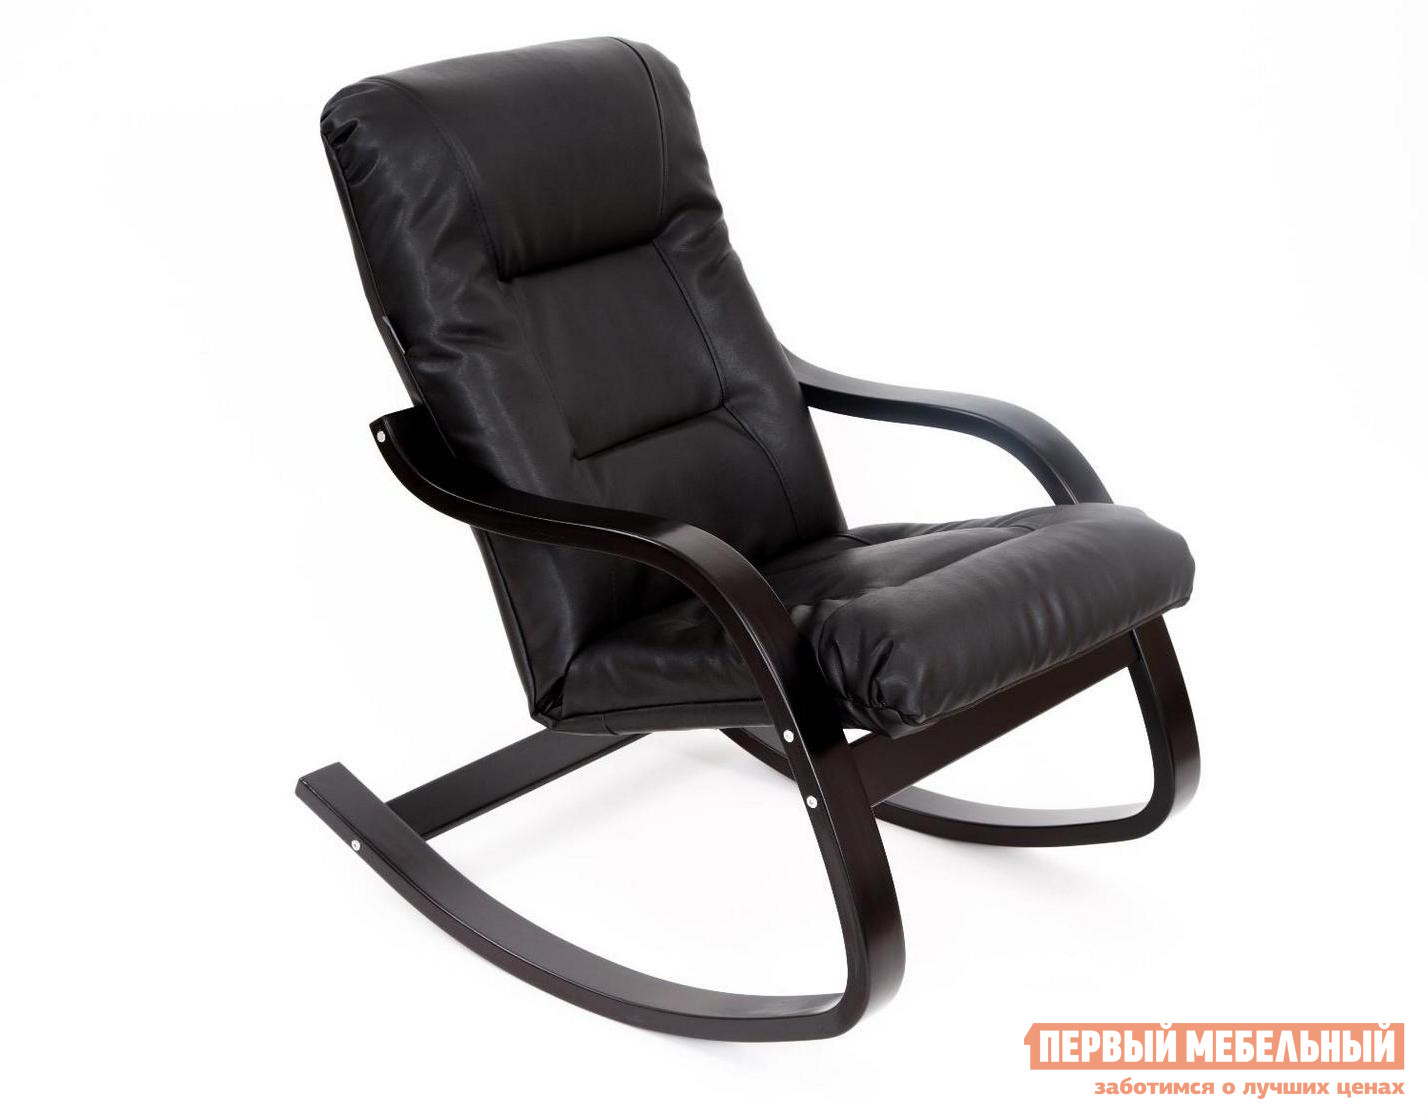 Кресло-качалка Грин Три Кресло-качалка ЭЙР NEW